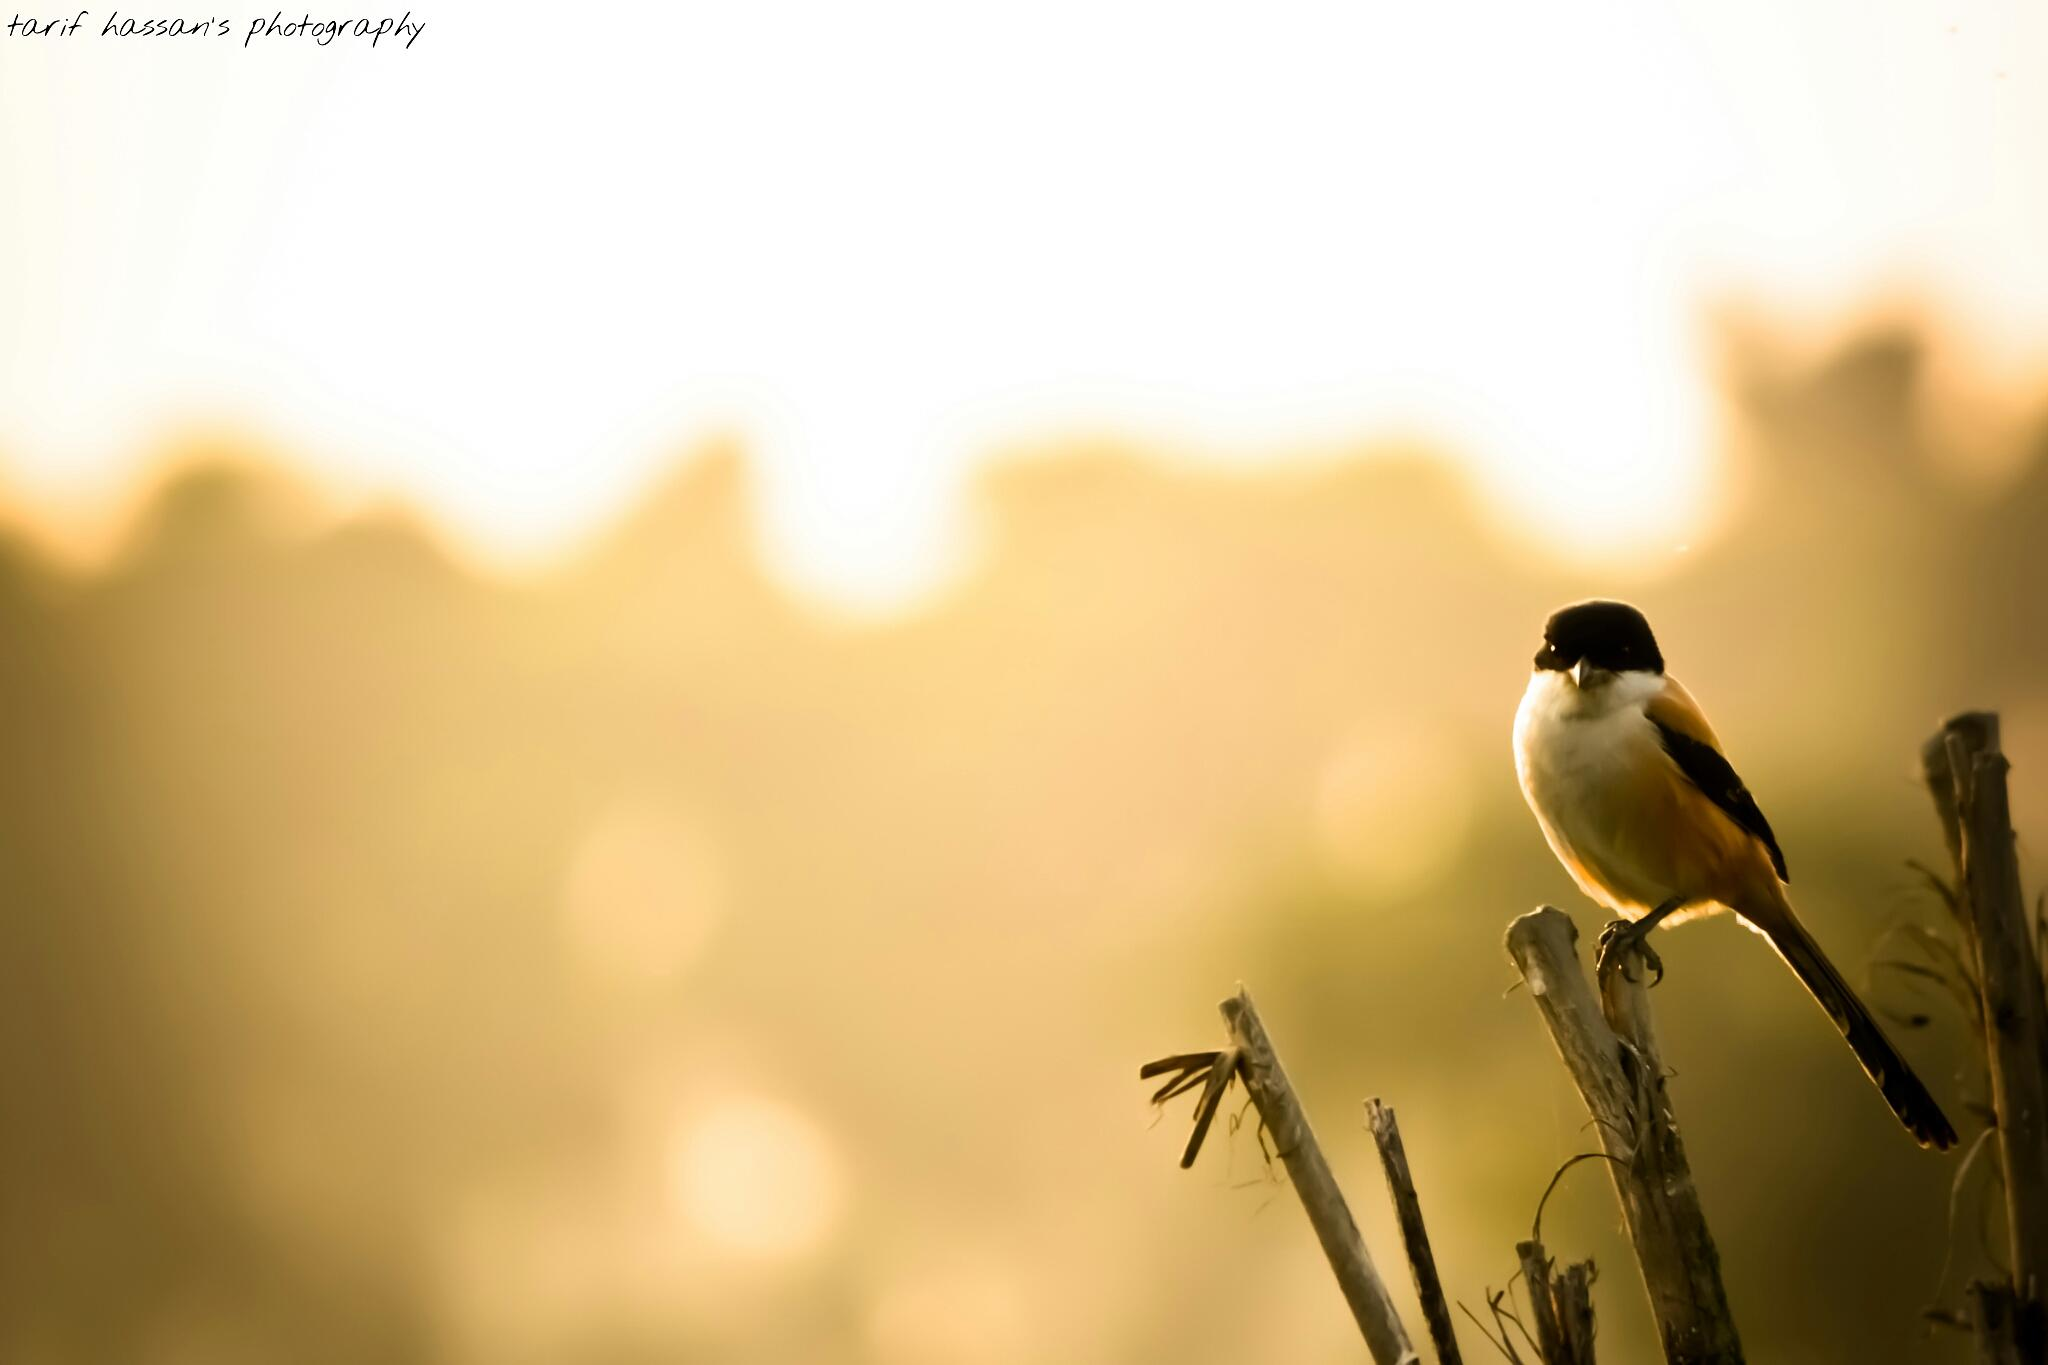 bird sets on branch by tarif.hassan.96